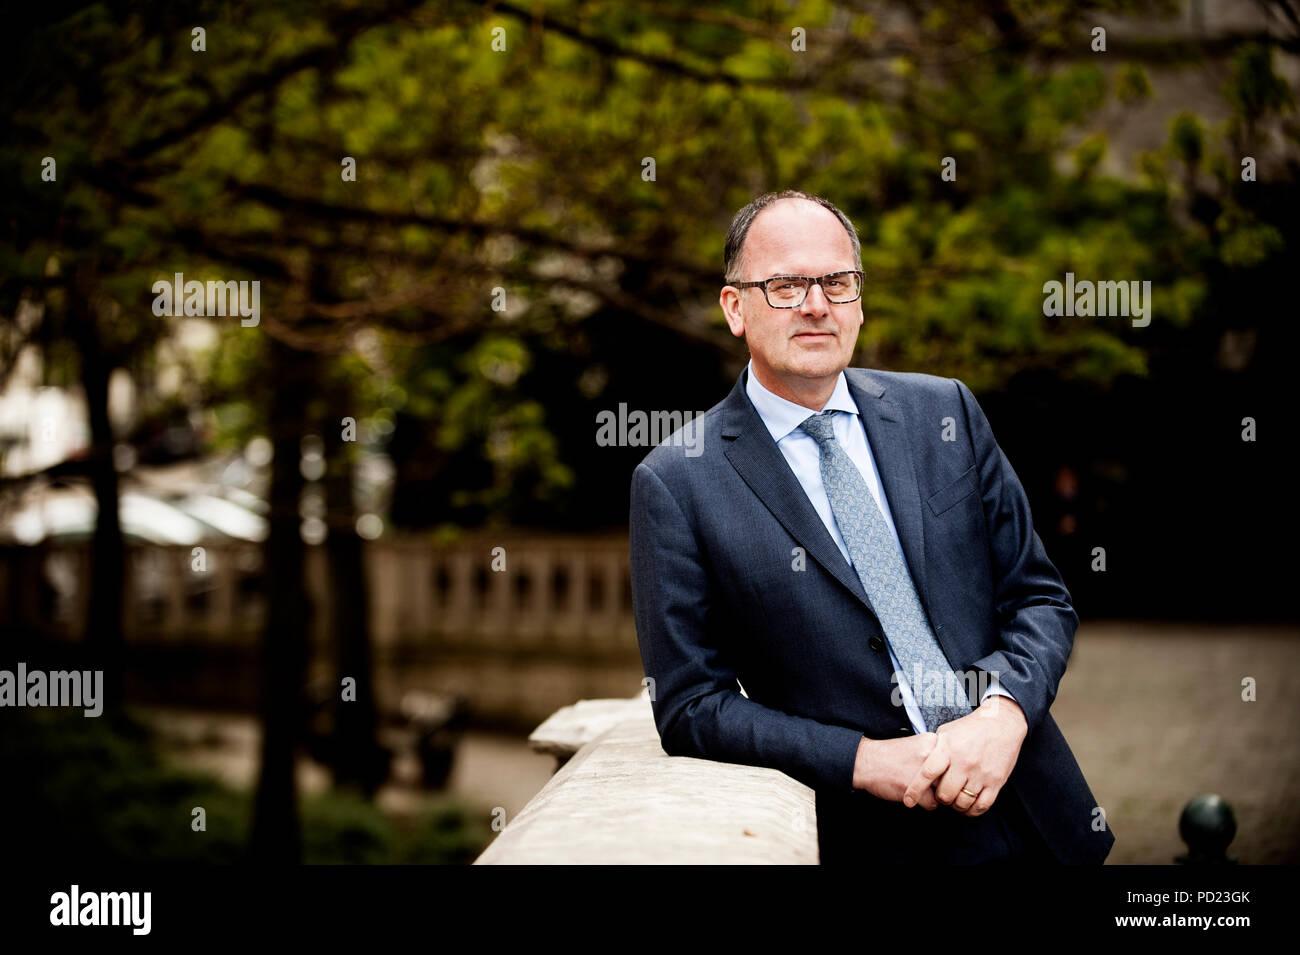 Bart De Smet, CEO from insurance company Ageas (Belgium, 05/04/2017) - Stock Image